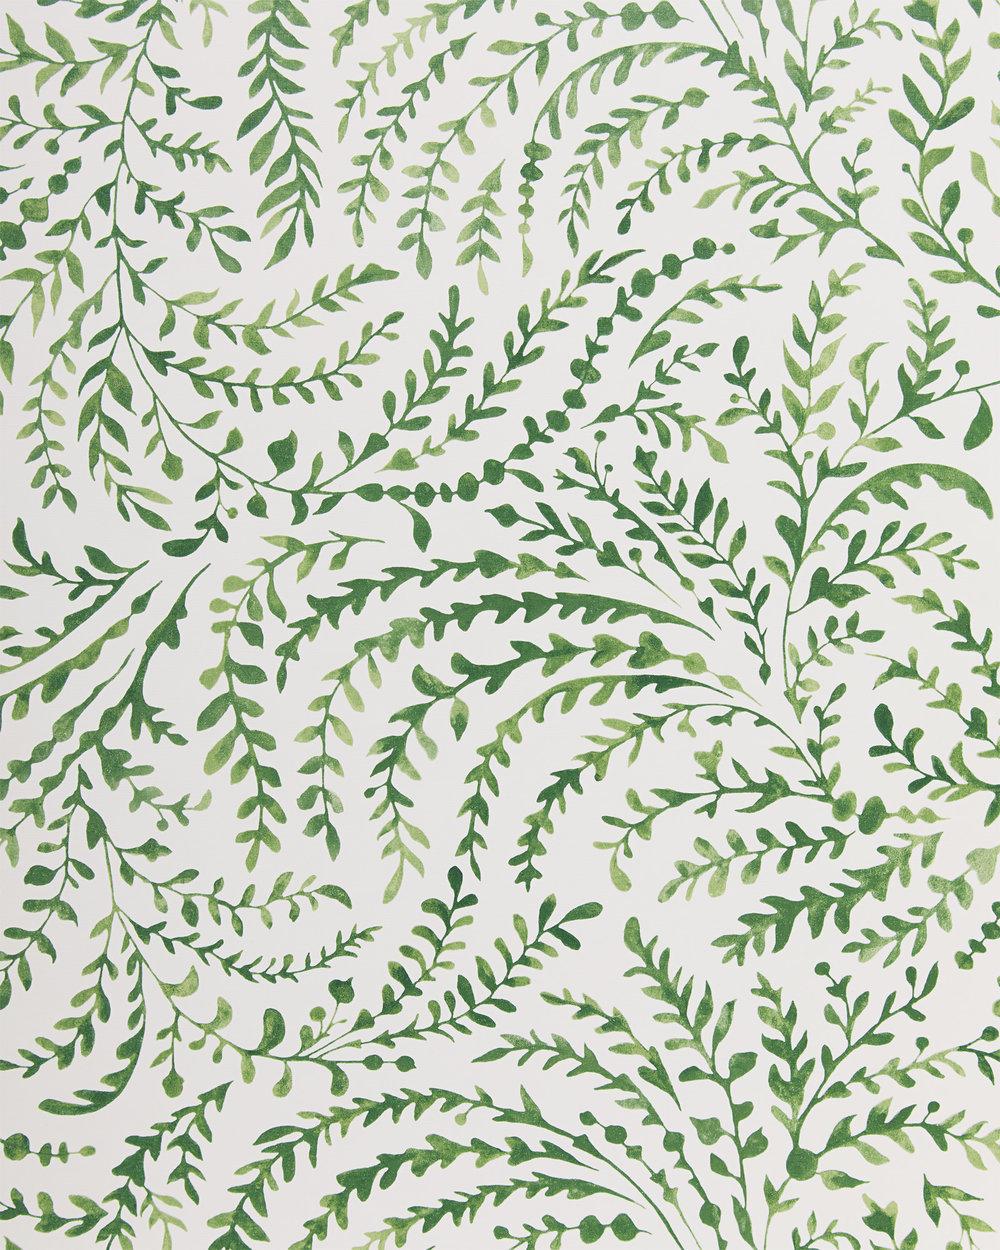 Wallpaper_Priano_Green_Full_MV_0590_Crop_BASE.jpg